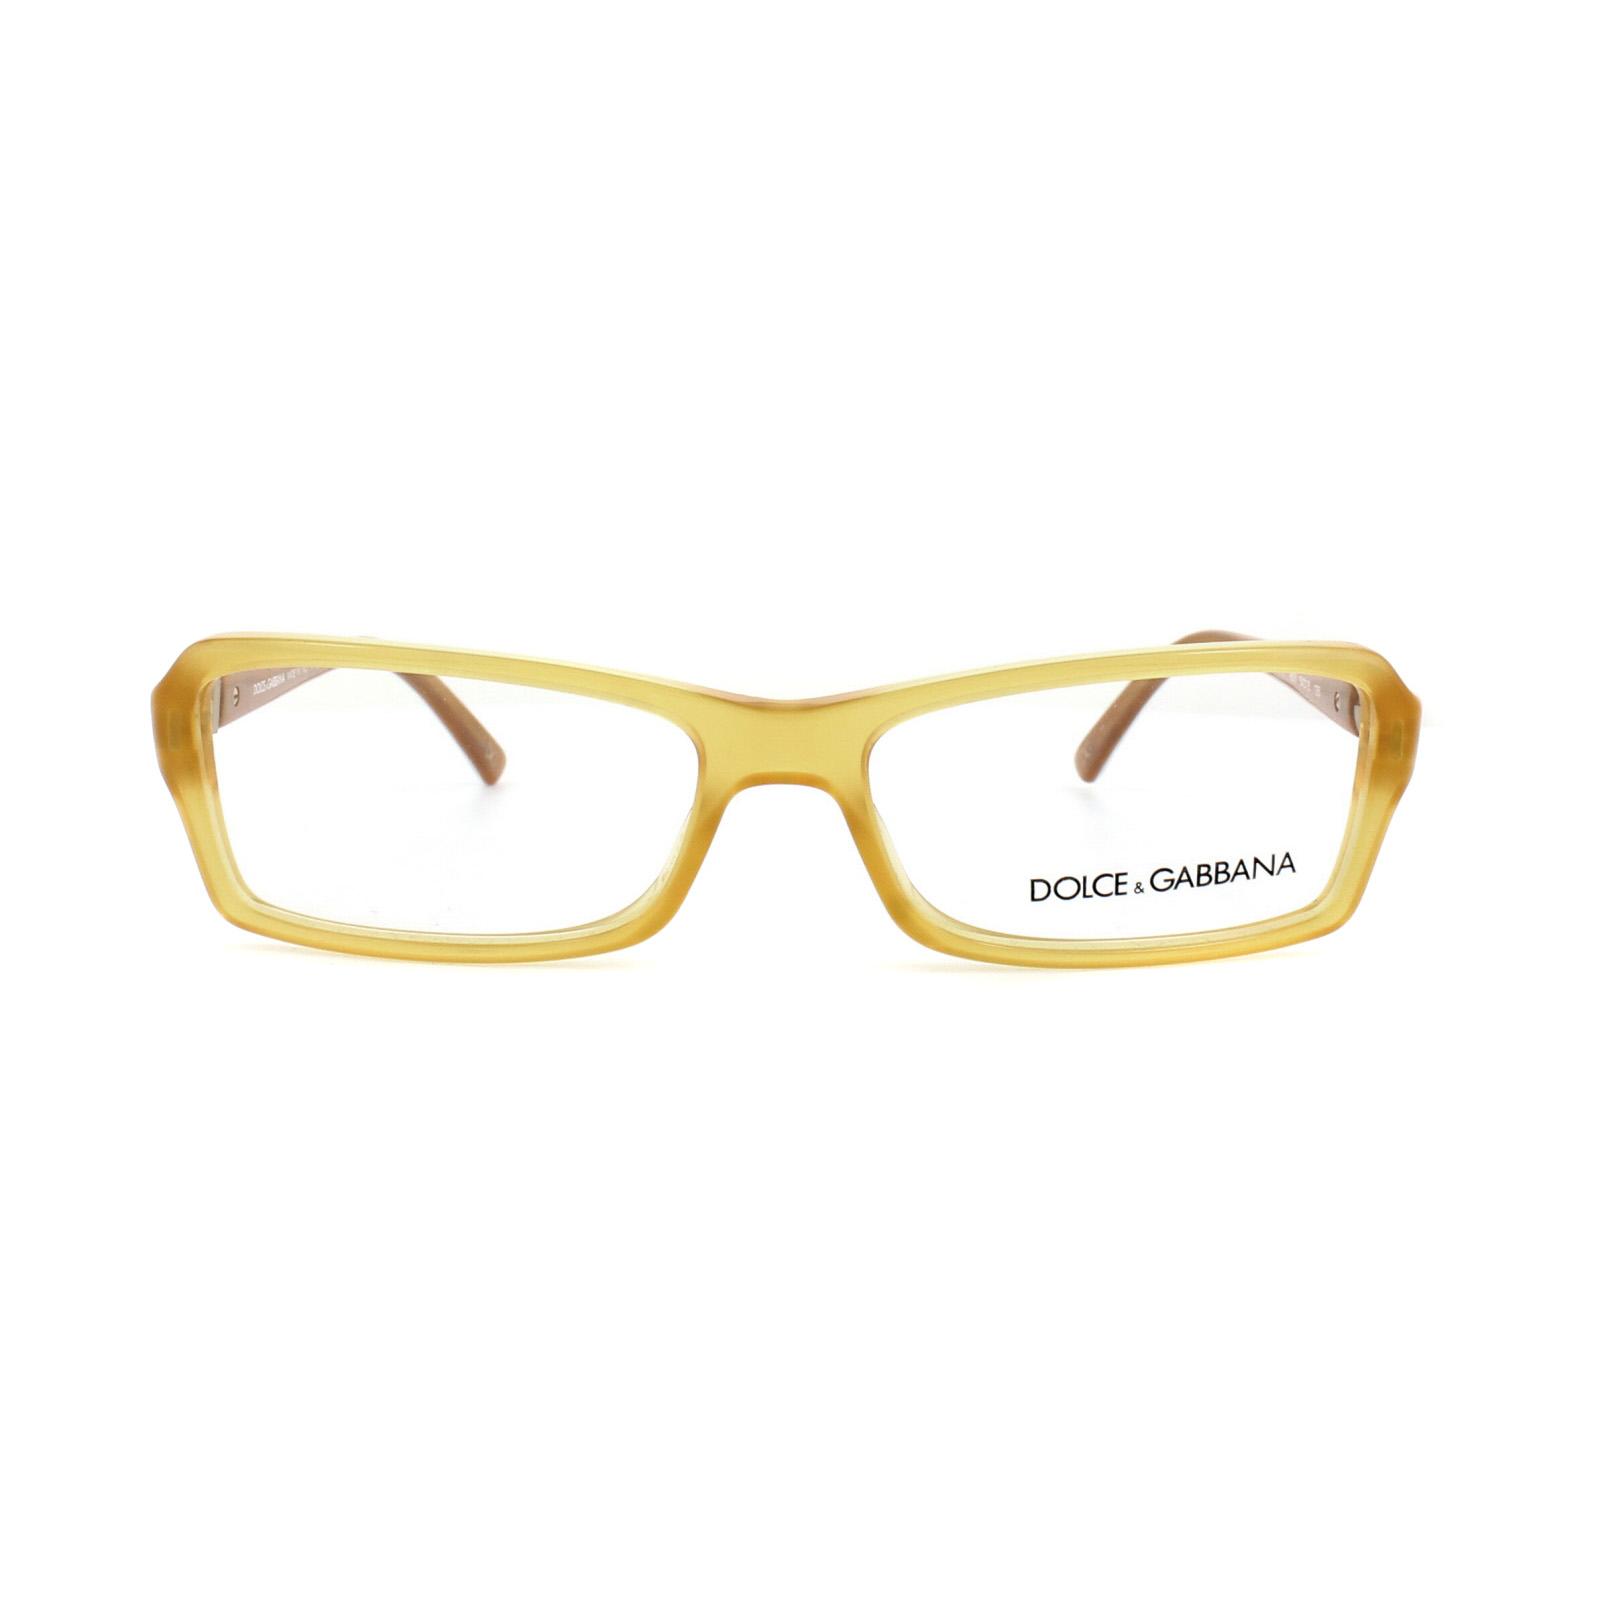 00b7290d5ad2 Sentinel Dolce and Gabbana Glasses Frames DG 3101 1833 Yellow Womens 54mm